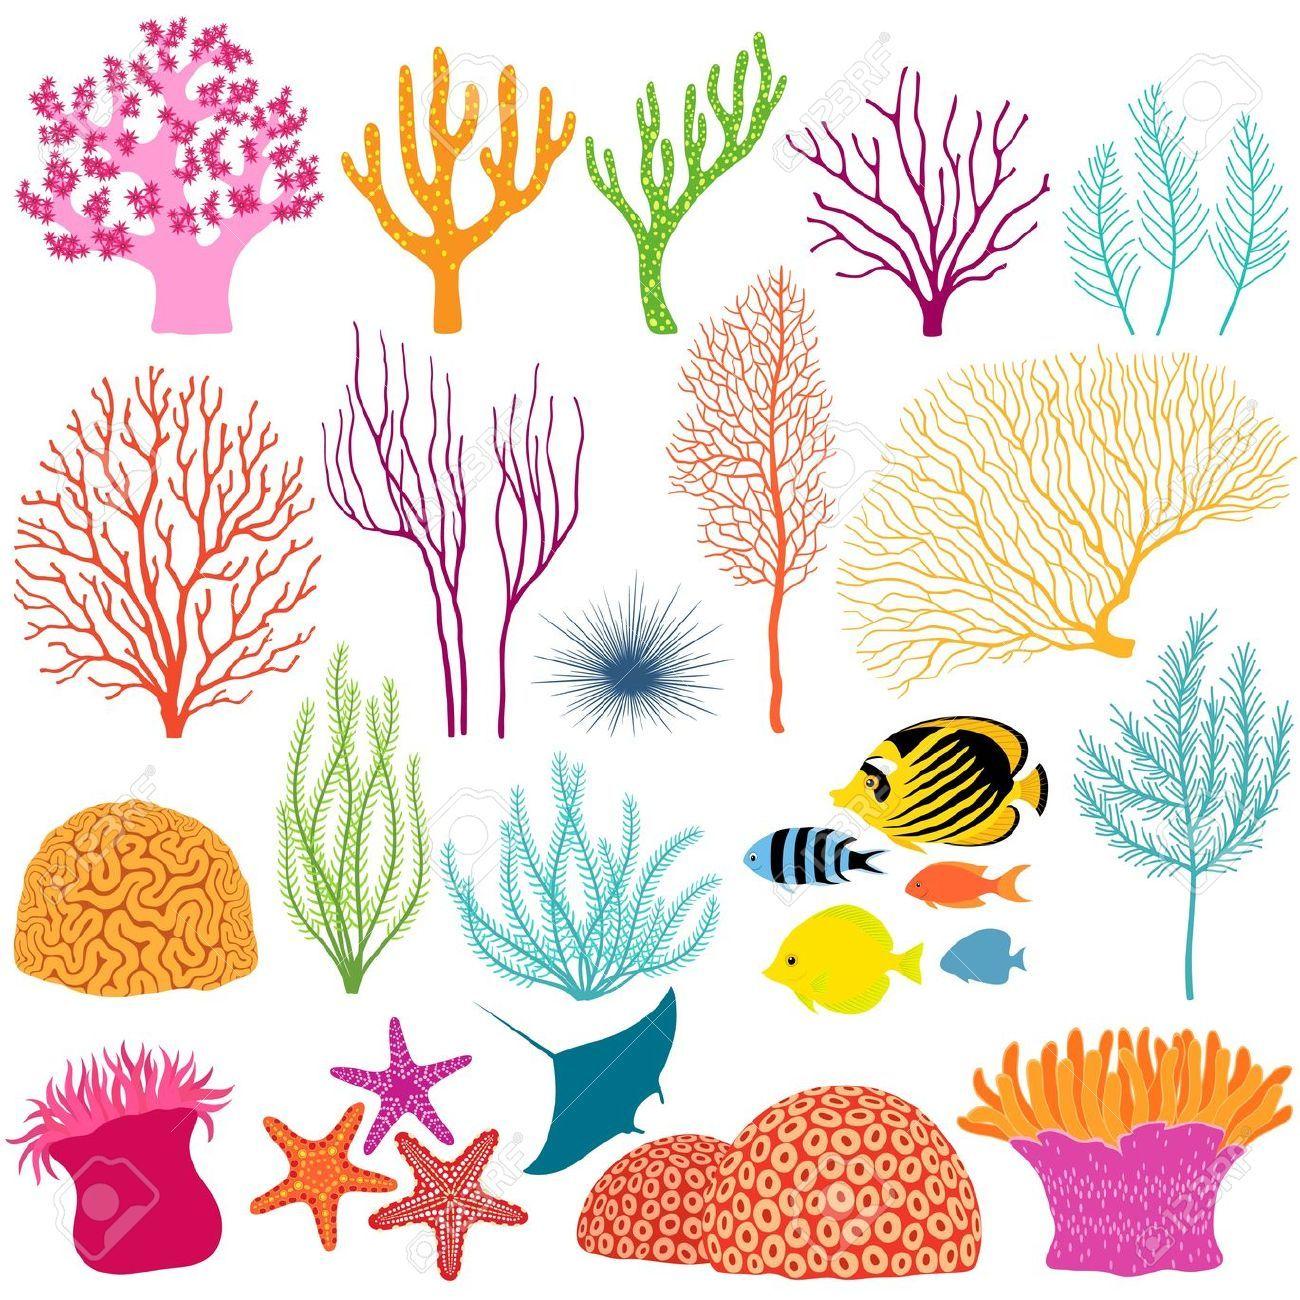 Underwater stock vector illustration. Algae clipart coral reef